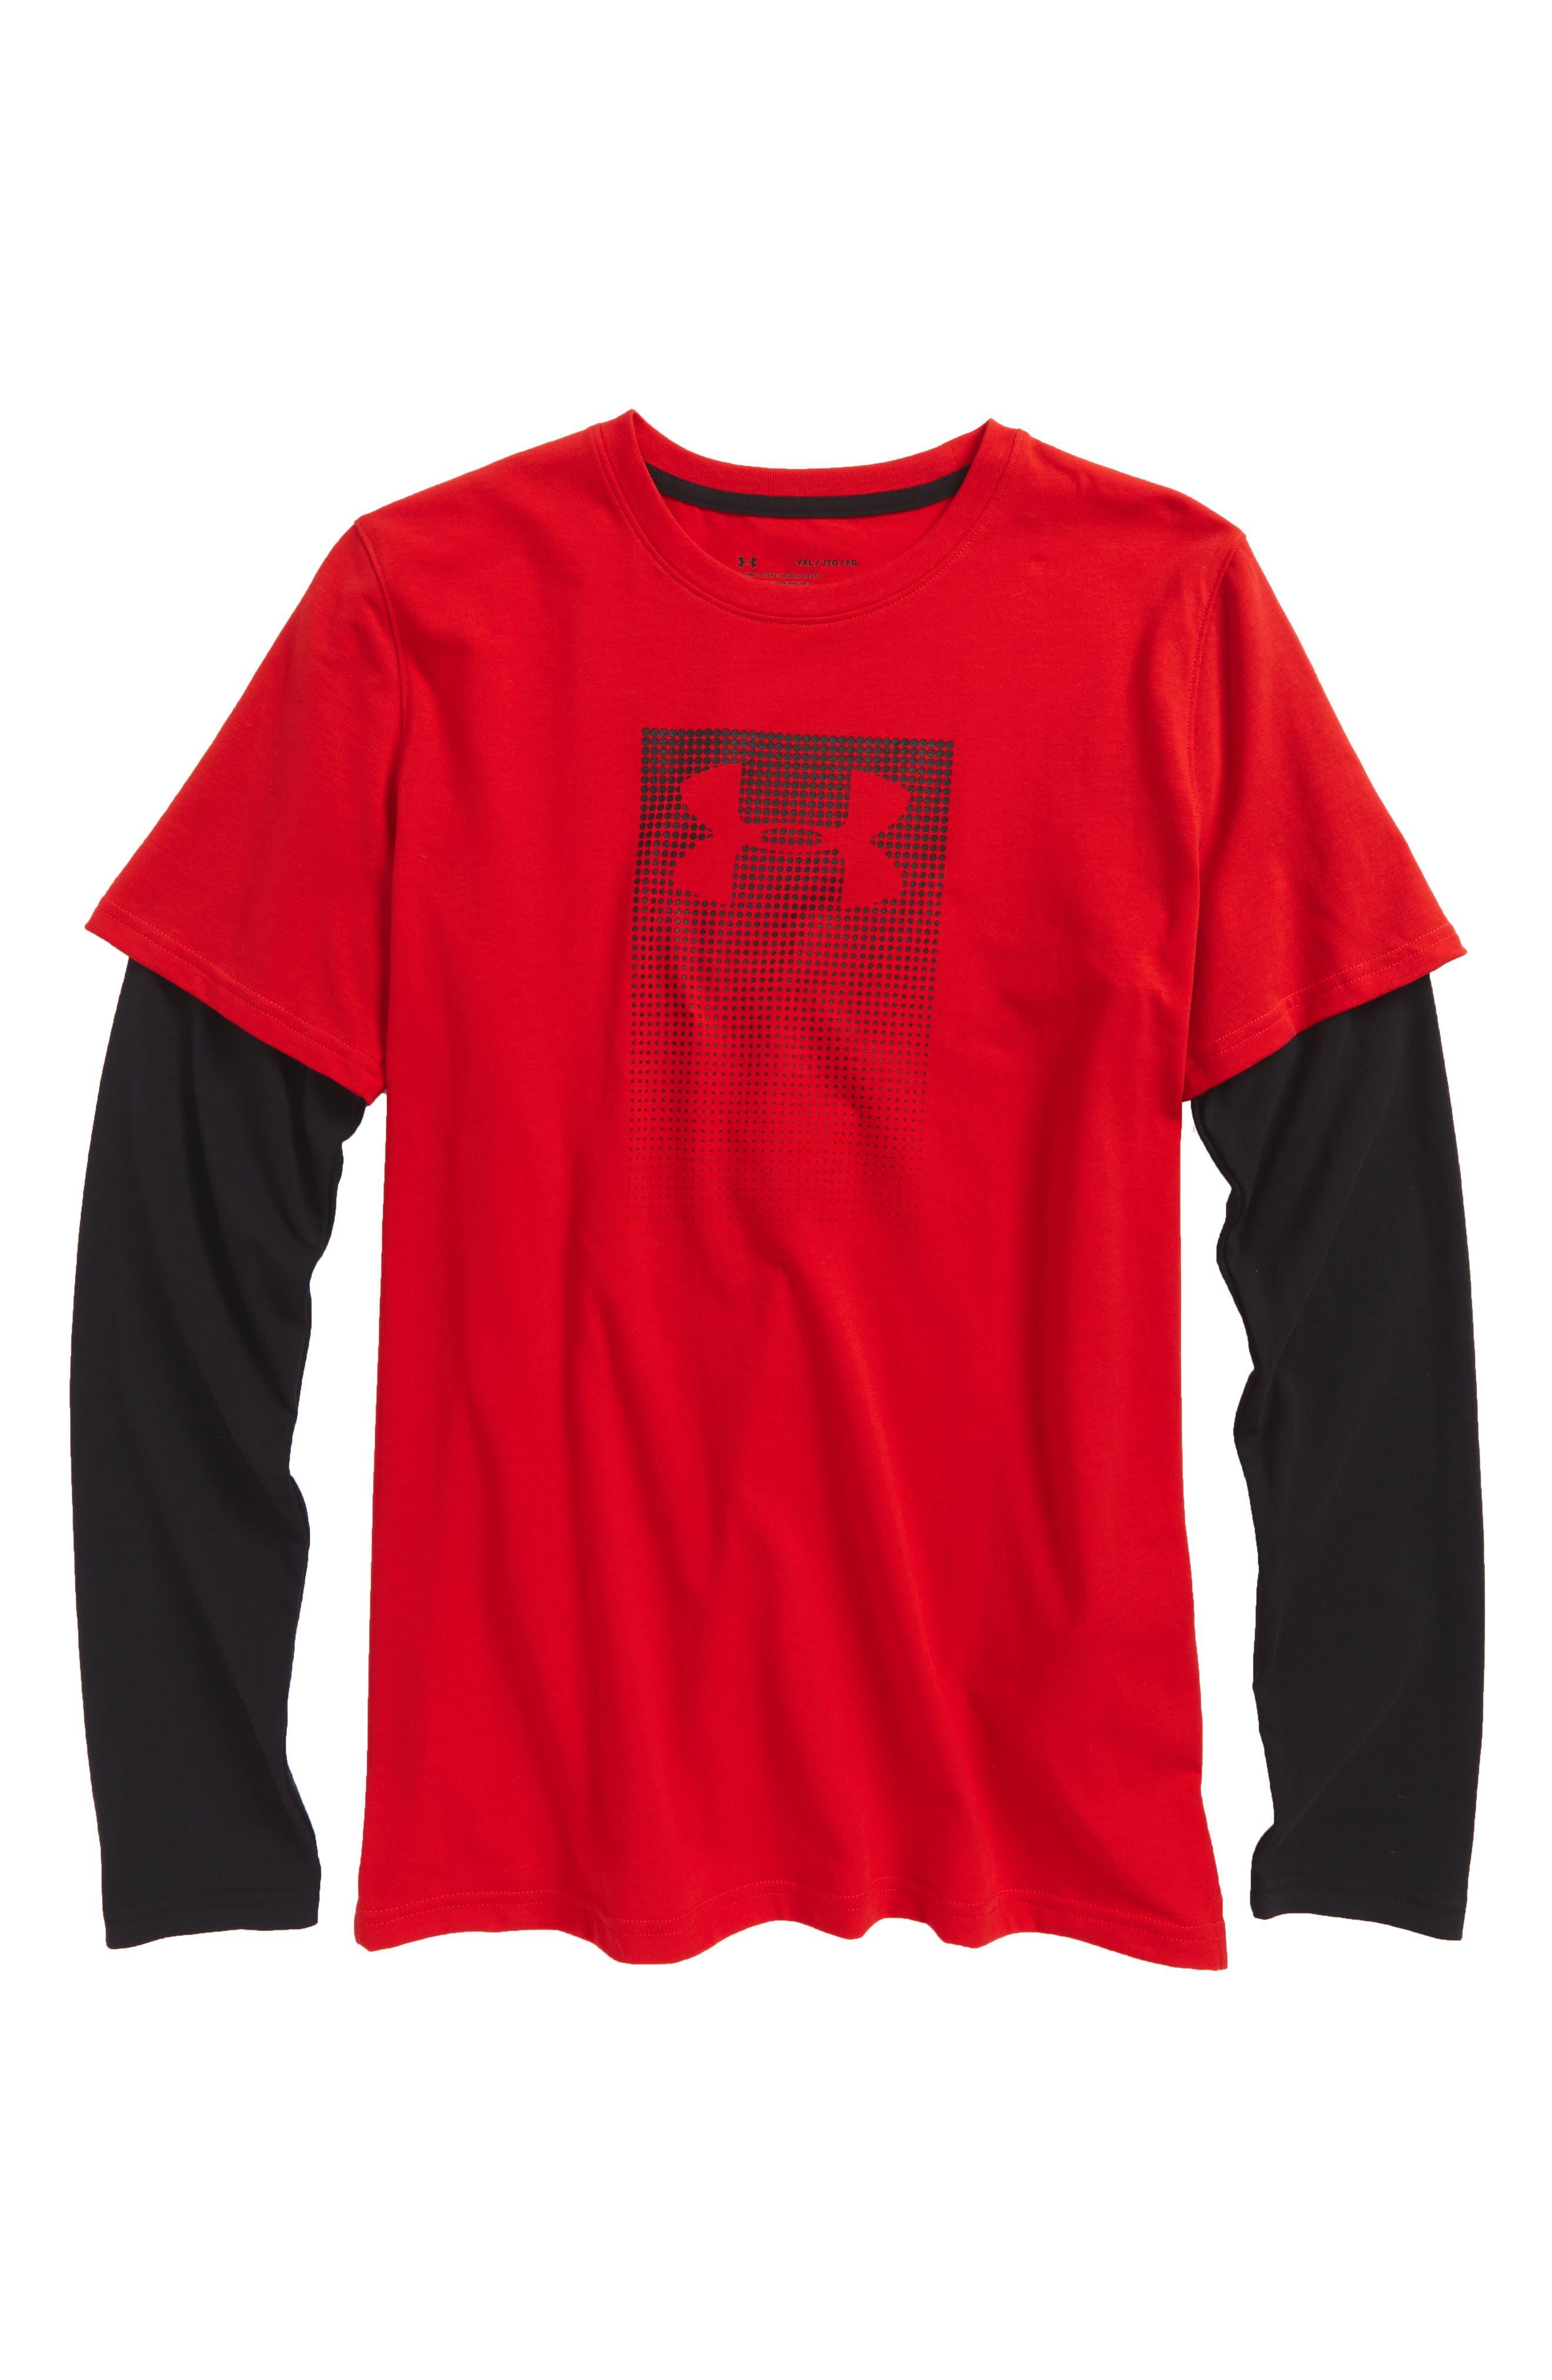 Long Sleeve HeatGear<sup>®</sup> T-Shirt,                             Main thumbnail 1, color,                             Red/ Black